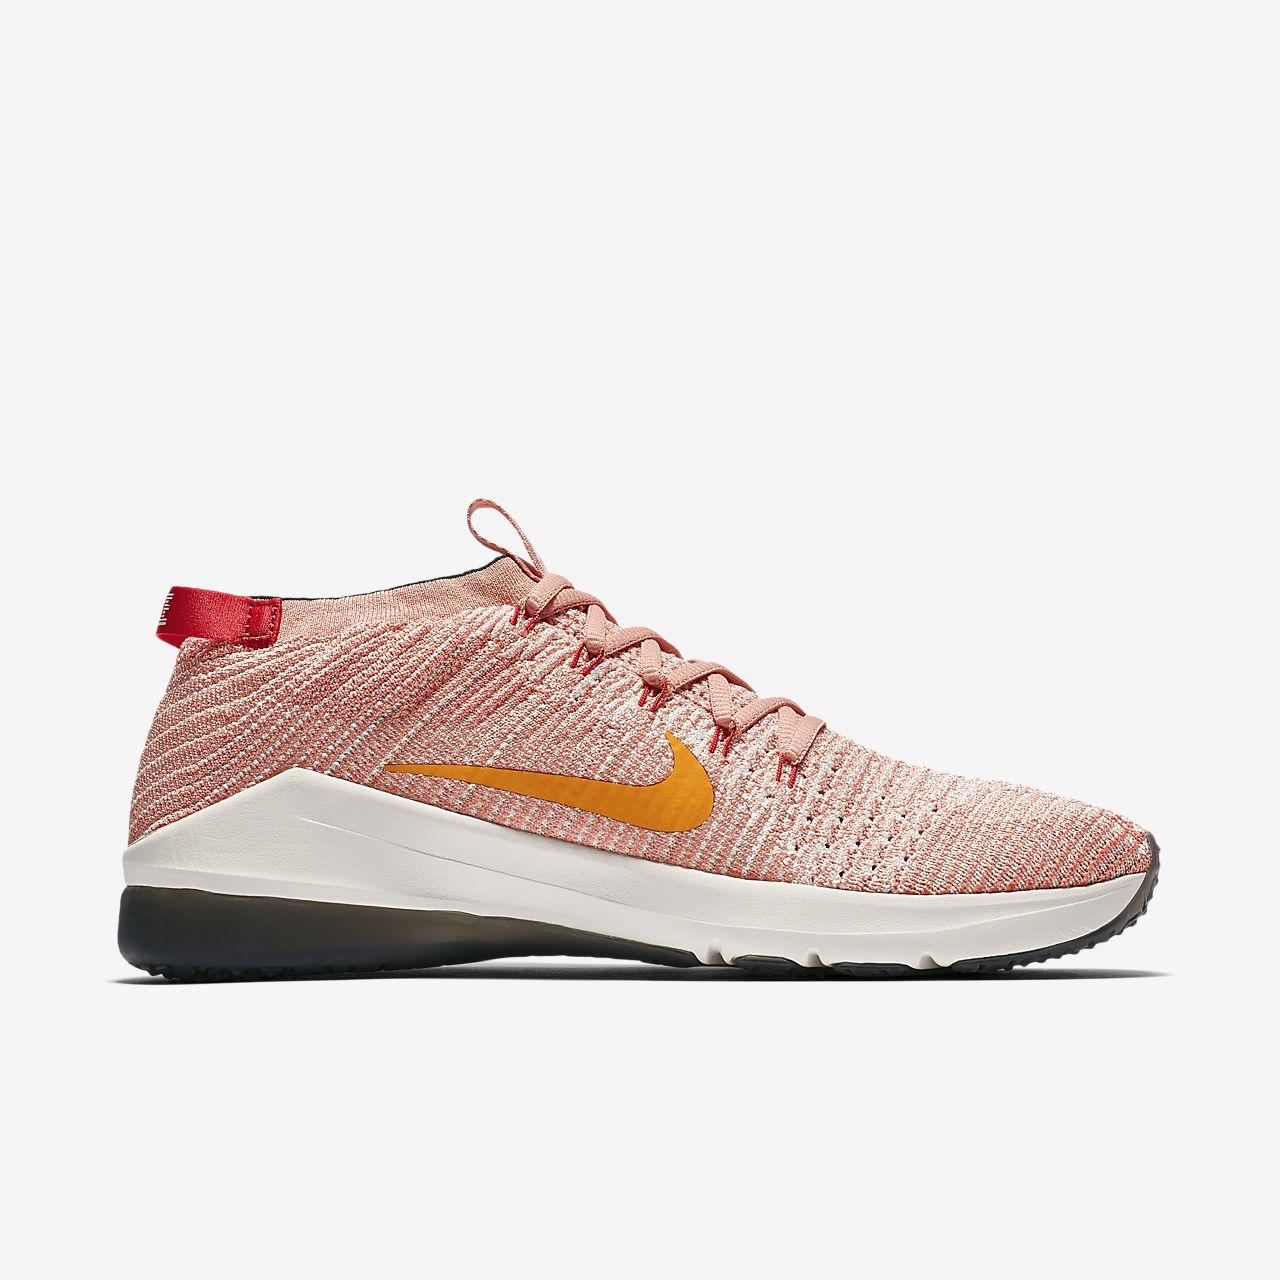 Nike Air Zoom SuperRep Damenschuhe für HIIT Kurse